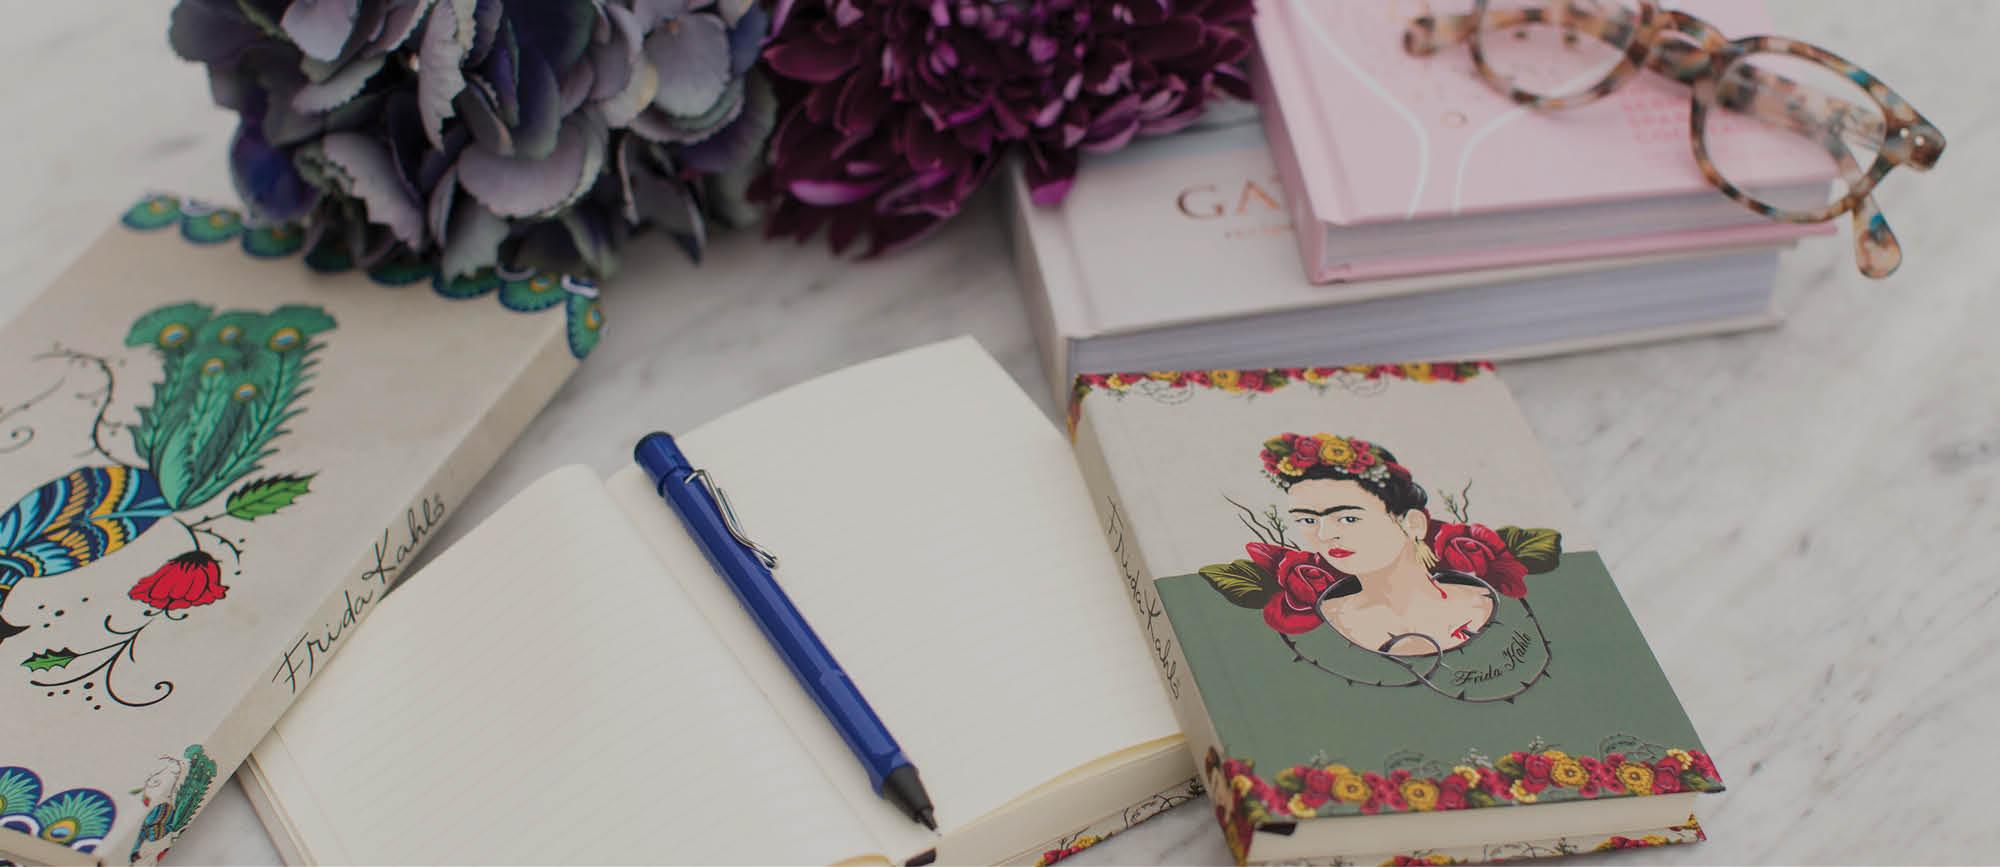 Journalling for Wellbeing by Jen Wood